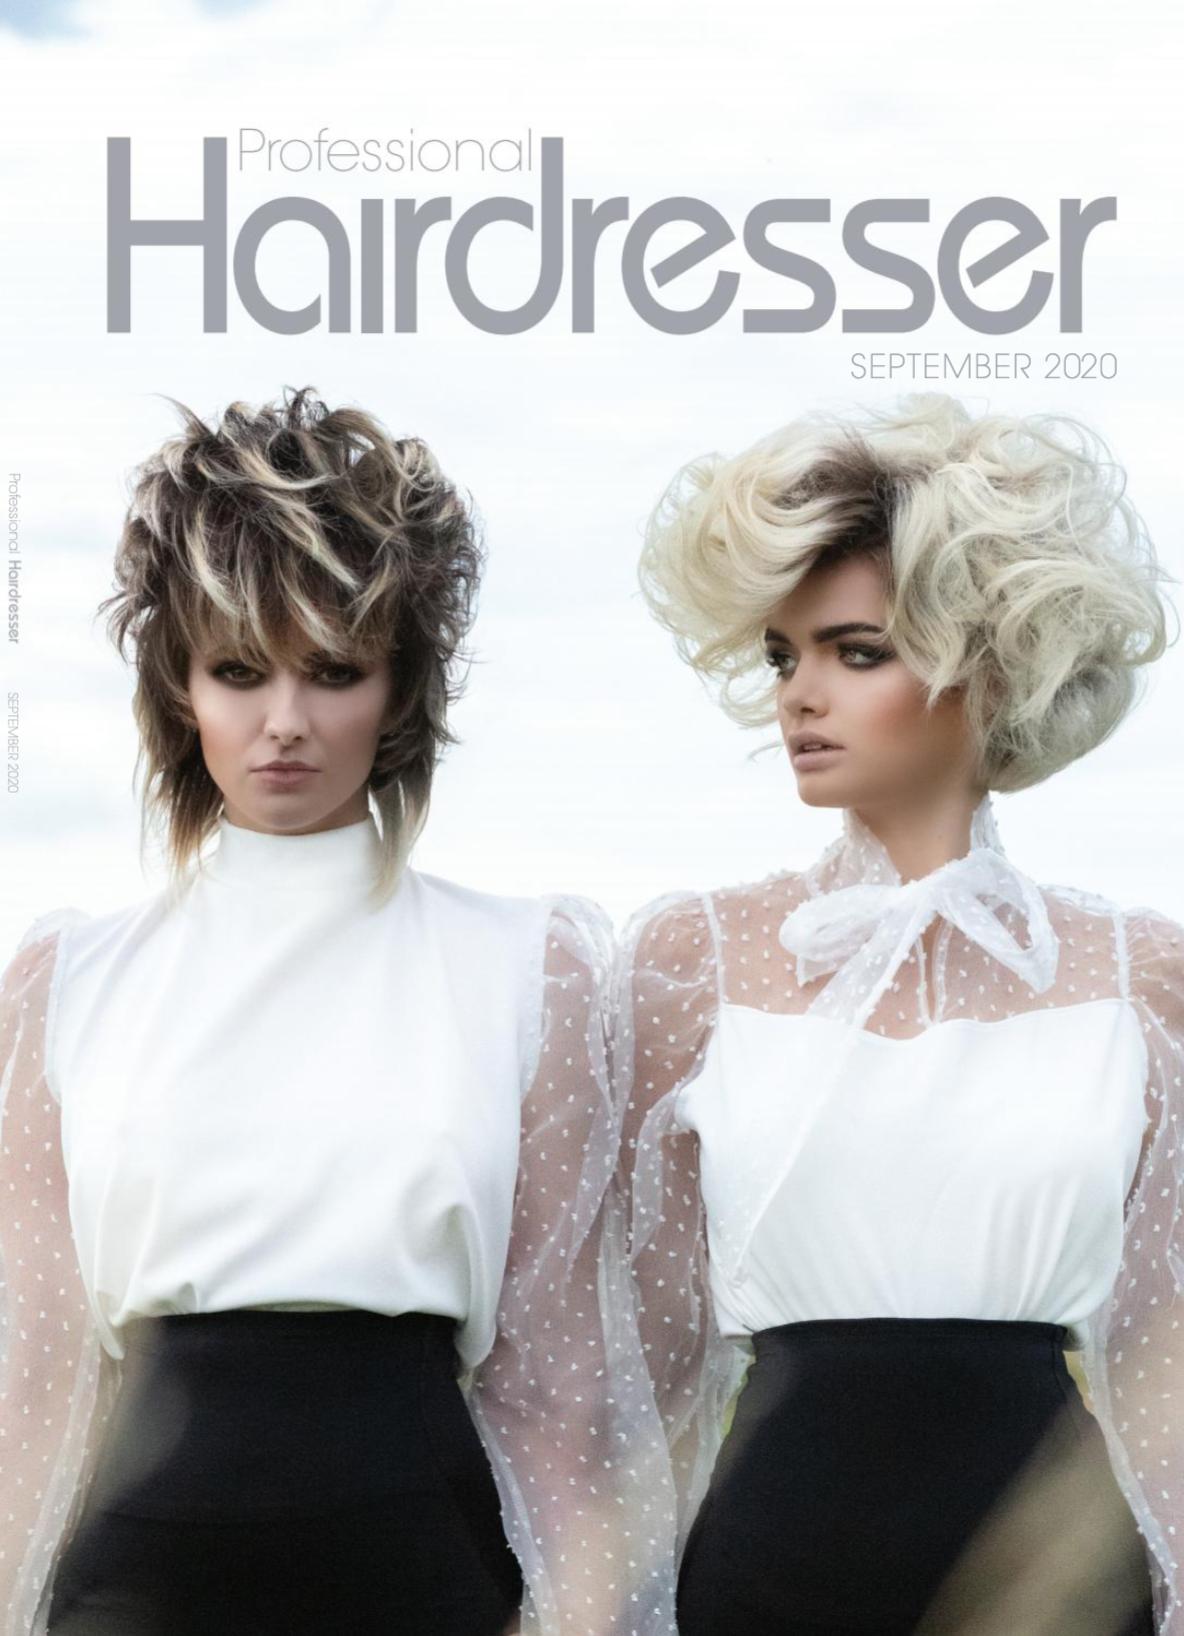 Professional Hairdresser September 2020